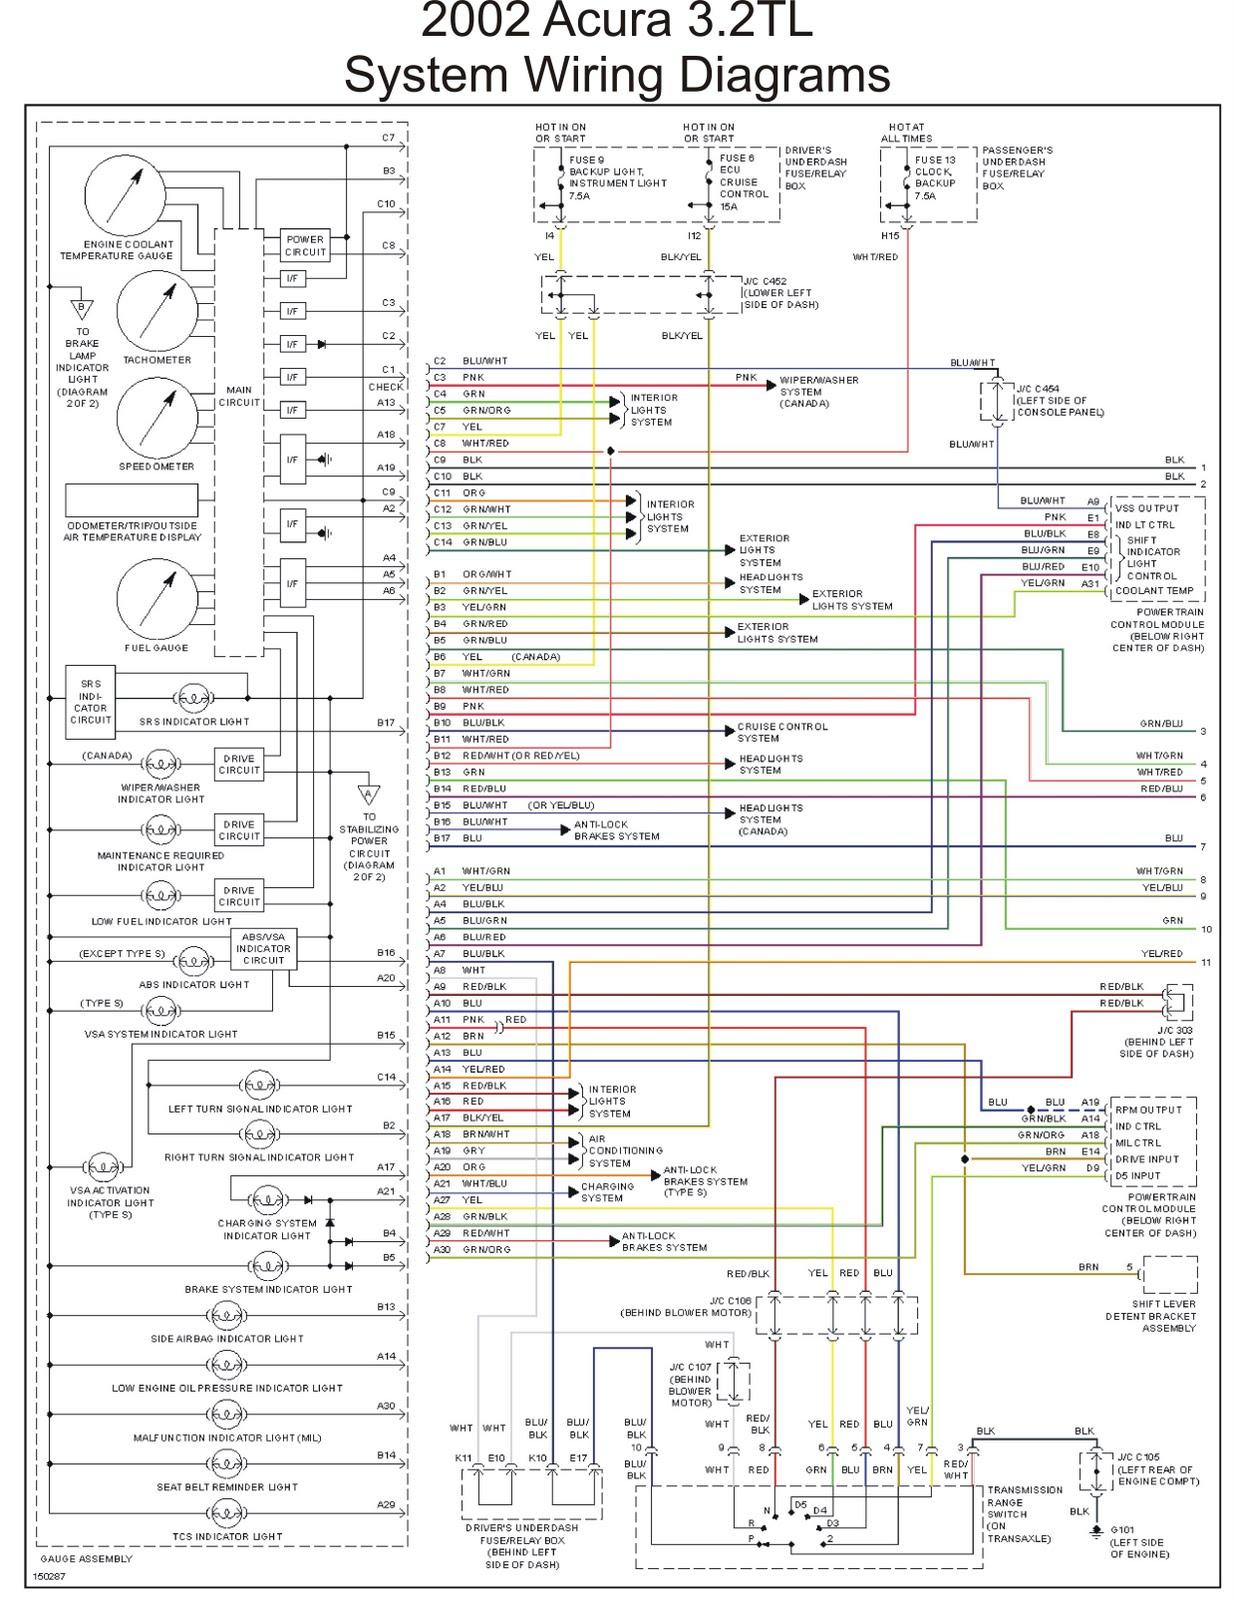 Awe Inspiring Acura Stereo Wiring Diagram Wiring Diagram Wiring Cloud Mousmenurrecoveryedborg